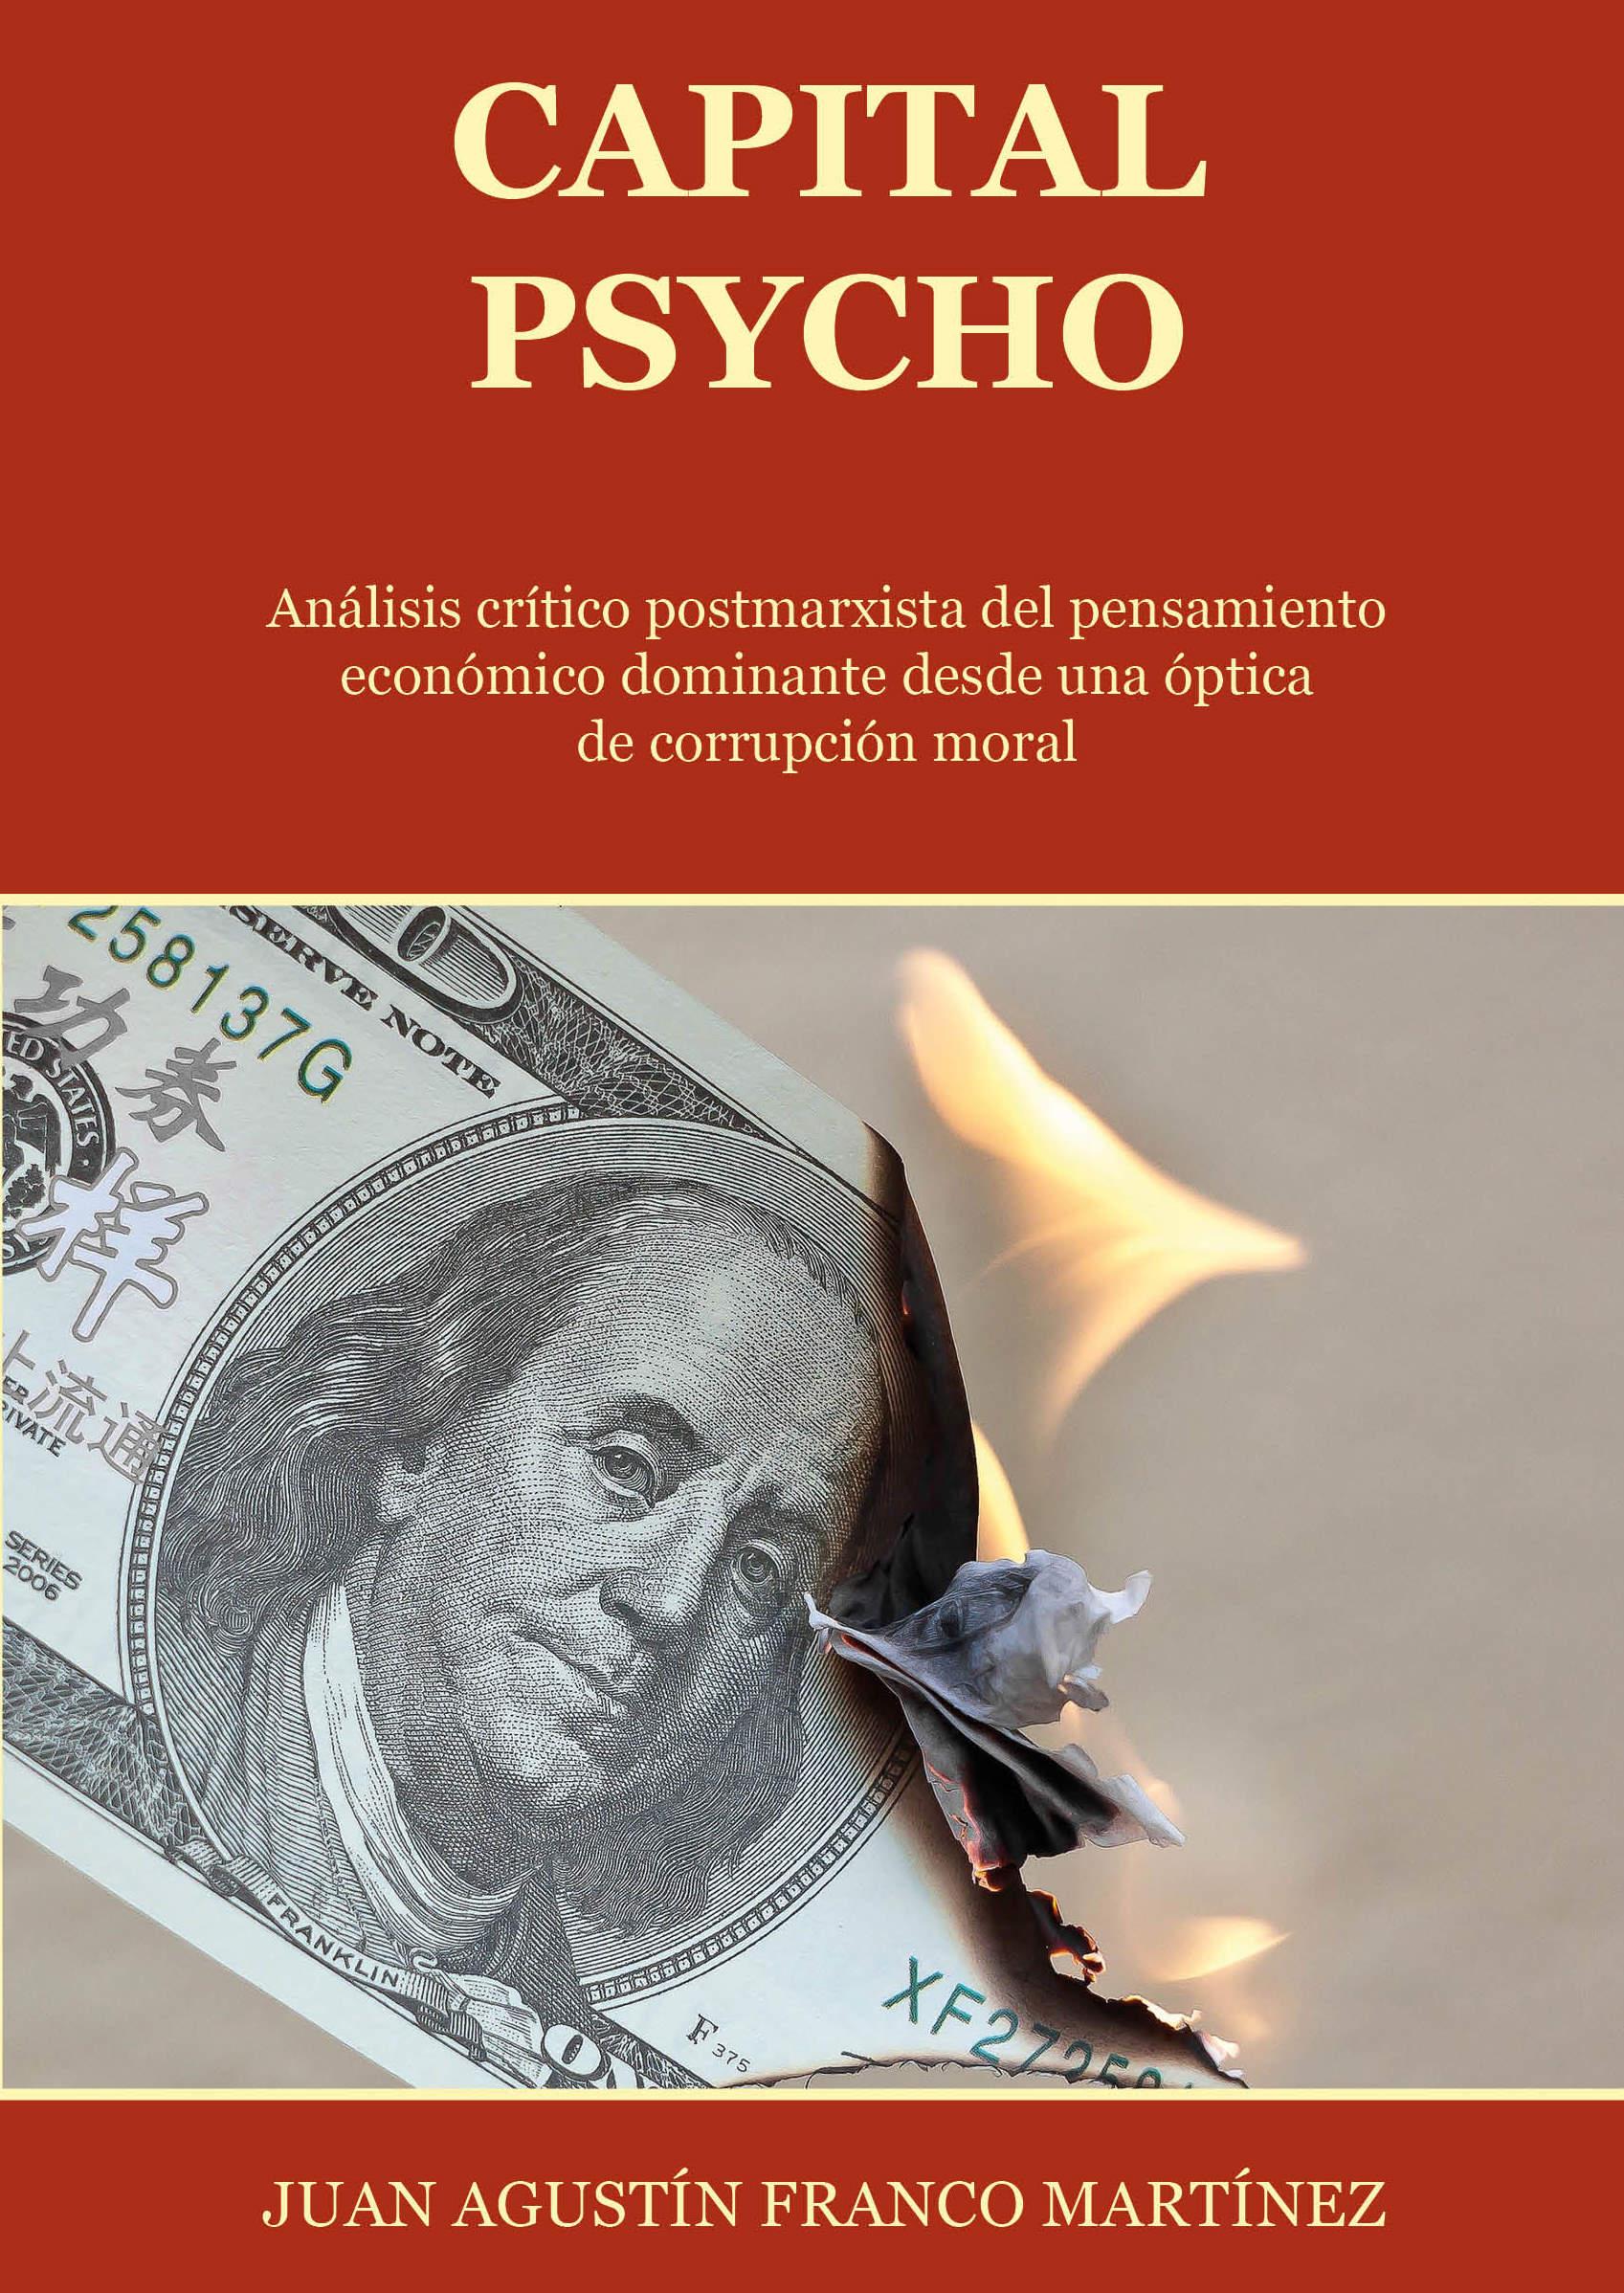 CAPITAL PSYCHO CUBIERTA